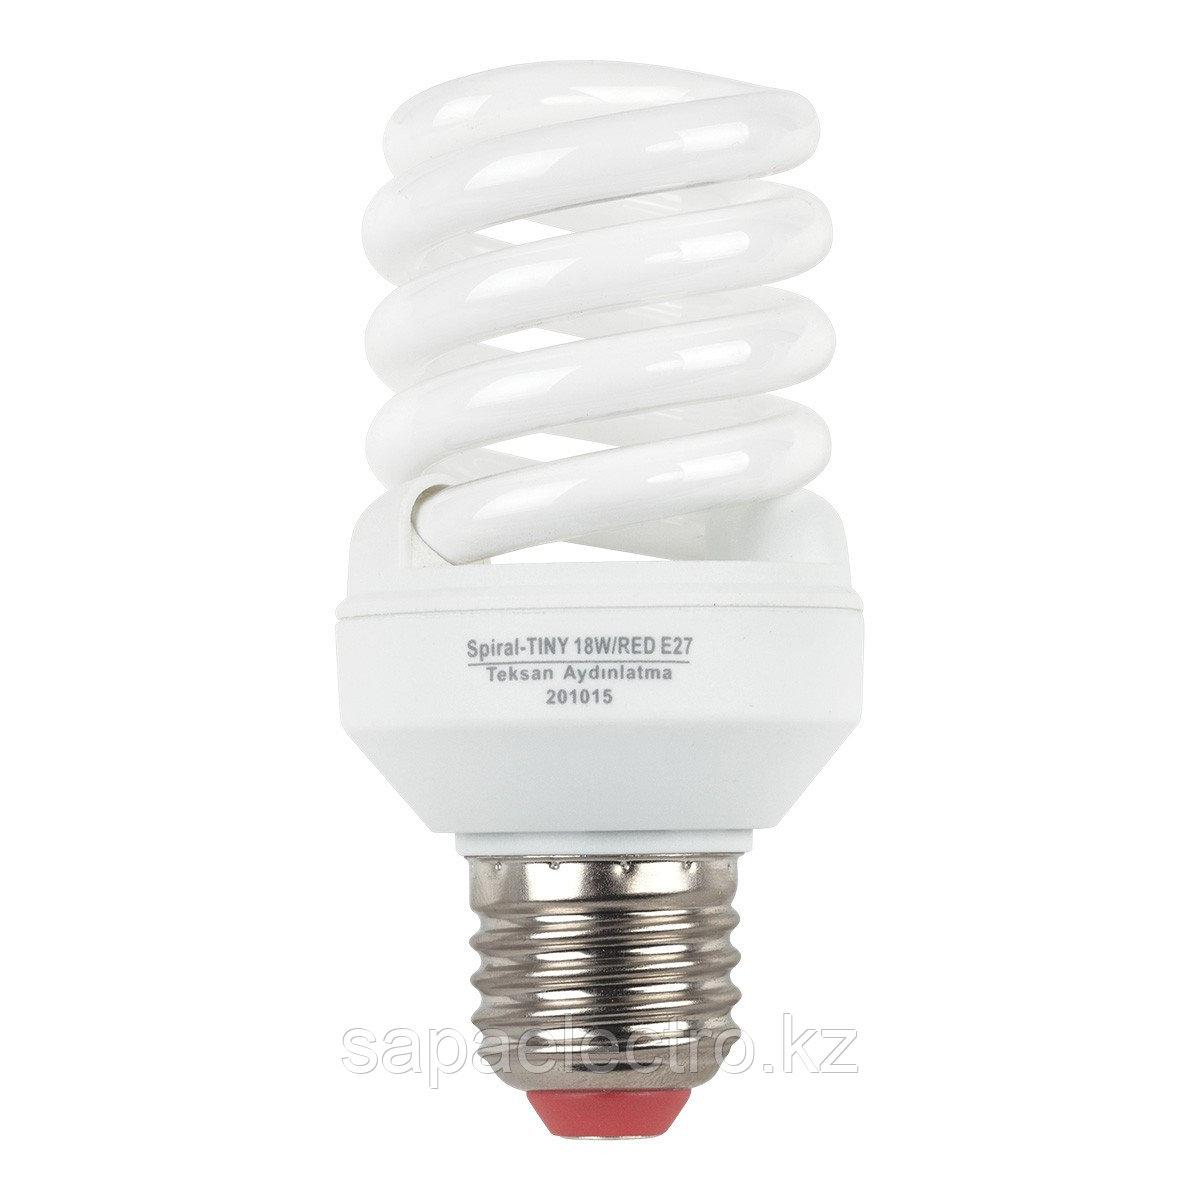 Лампа SPIRAL TINY  18W   E27  RED (TL) 100шт